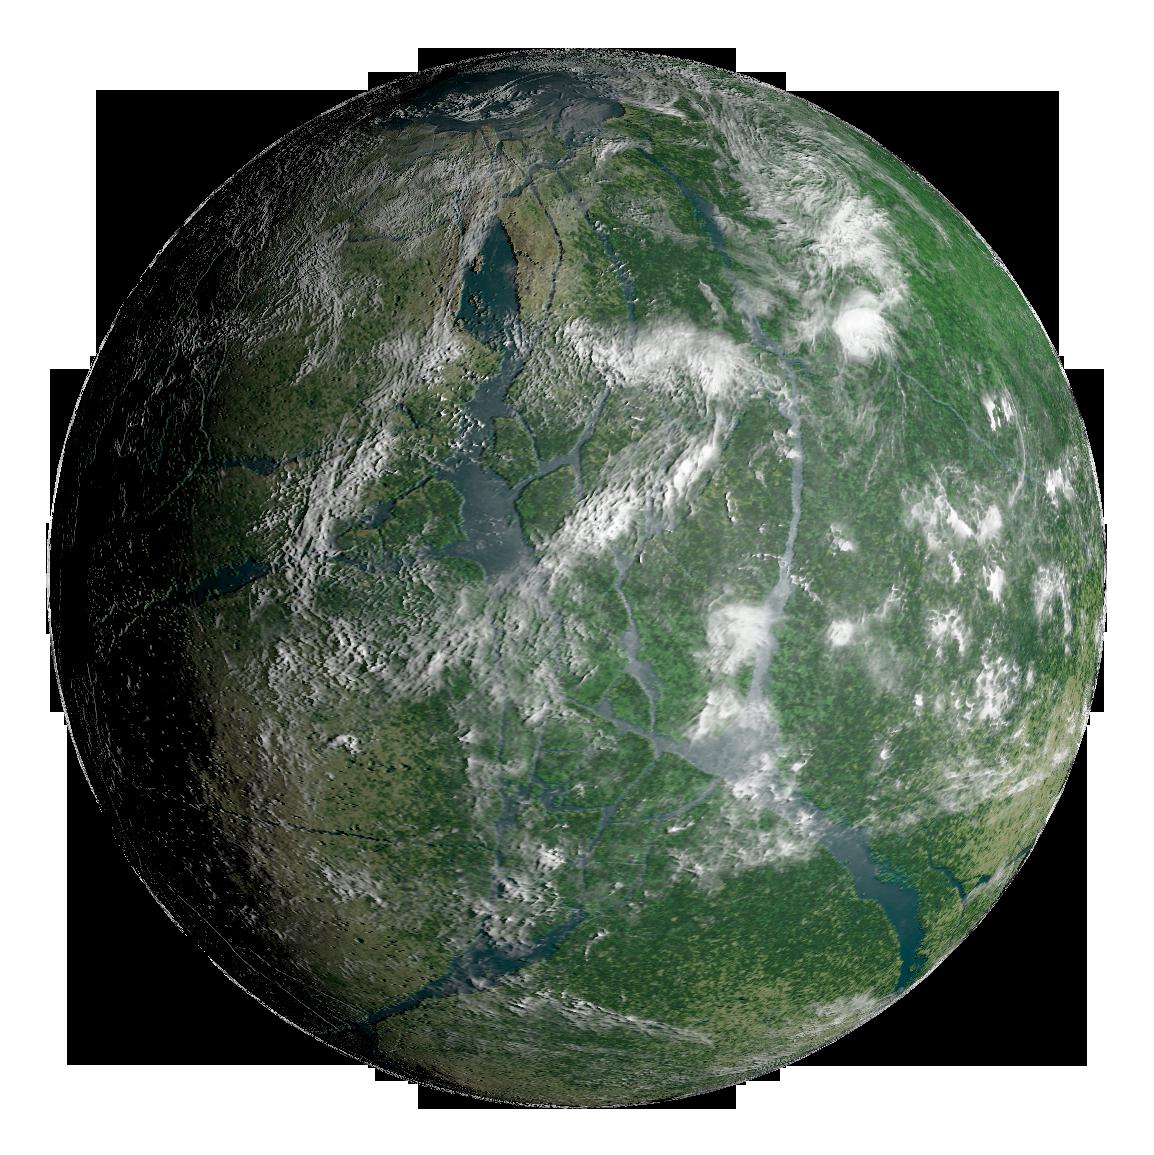 120512 - Terrestrial Planet - 130621 by avmorgan on DeviantArt